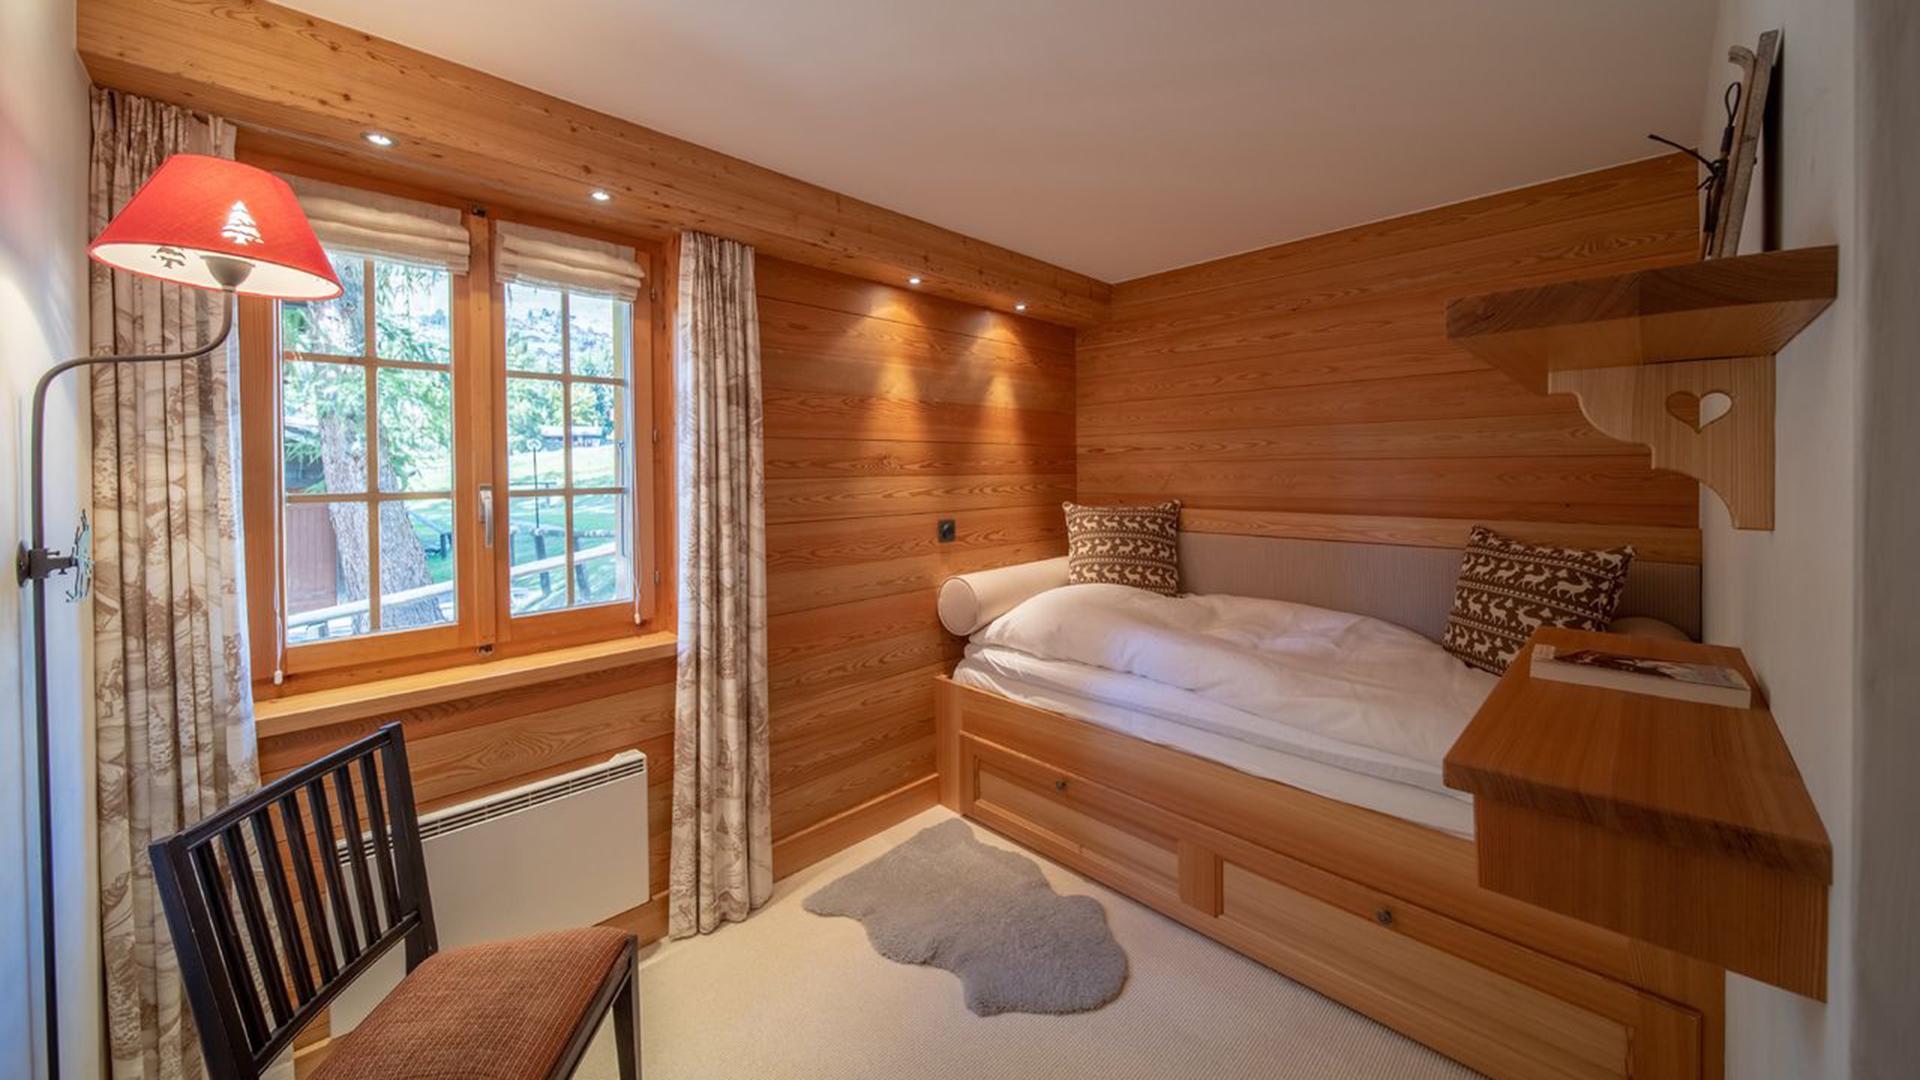 Flemmard 103 Apartments, Switzerland